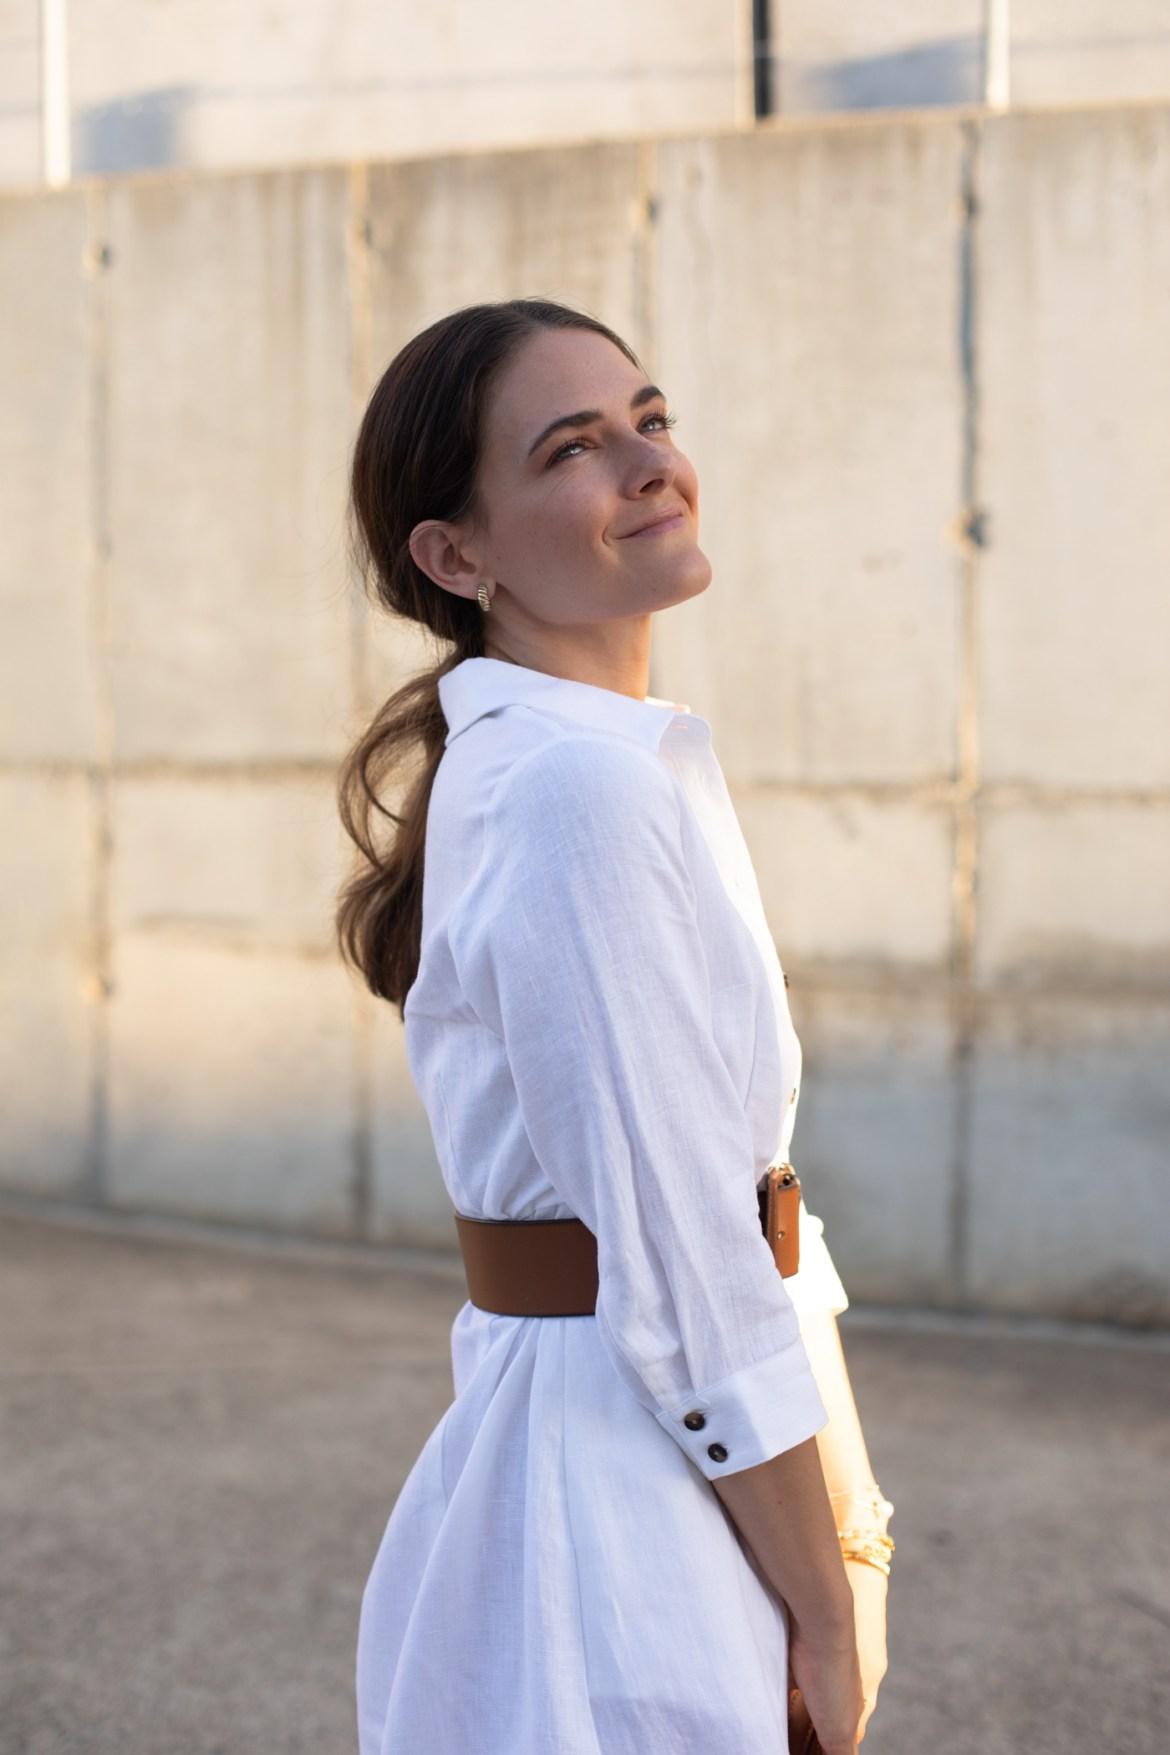 Jenelle Witty from Australian style blog Inspiring Wit wearing white linen